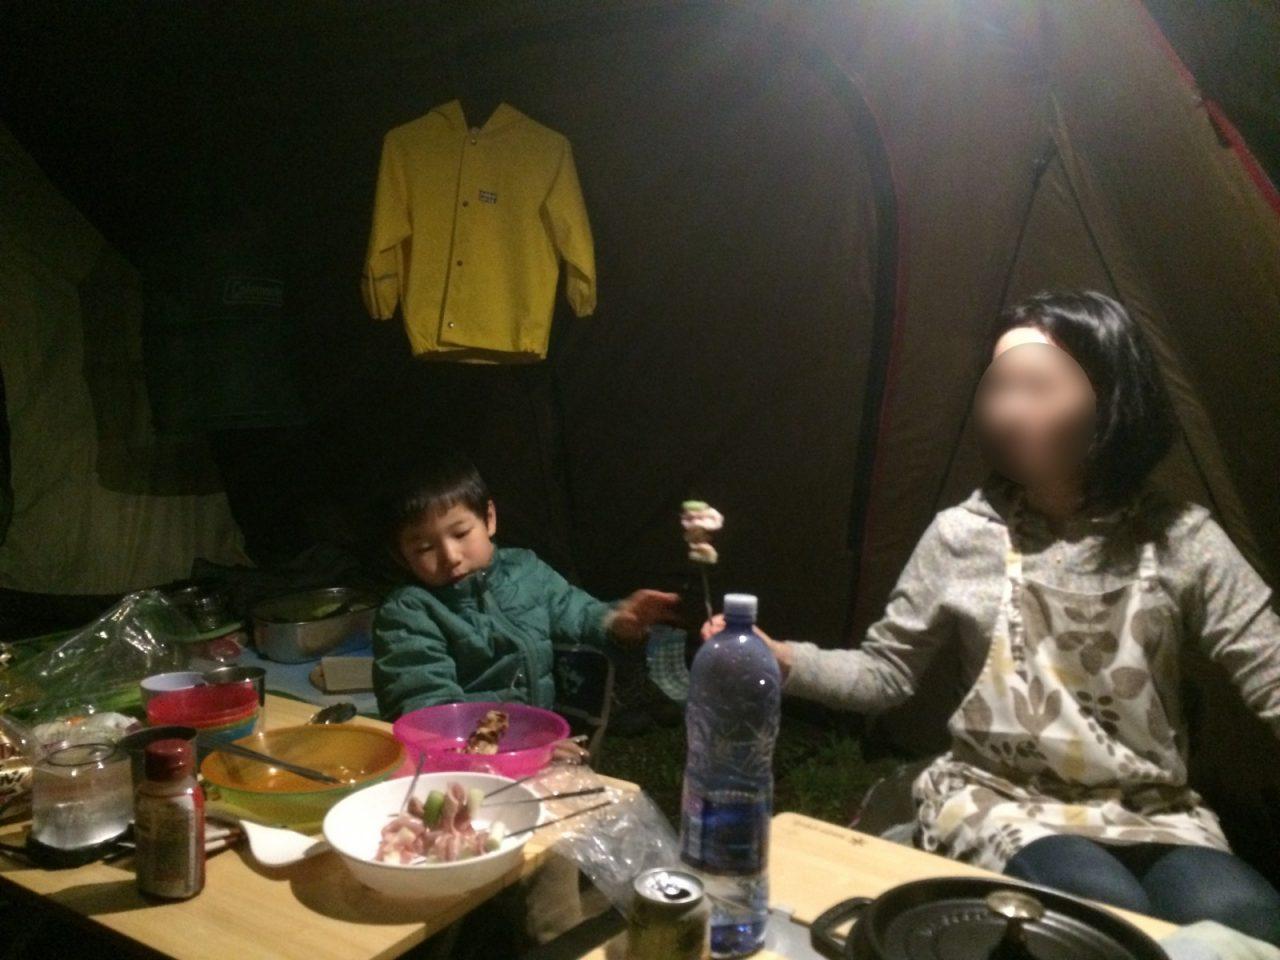 842moz